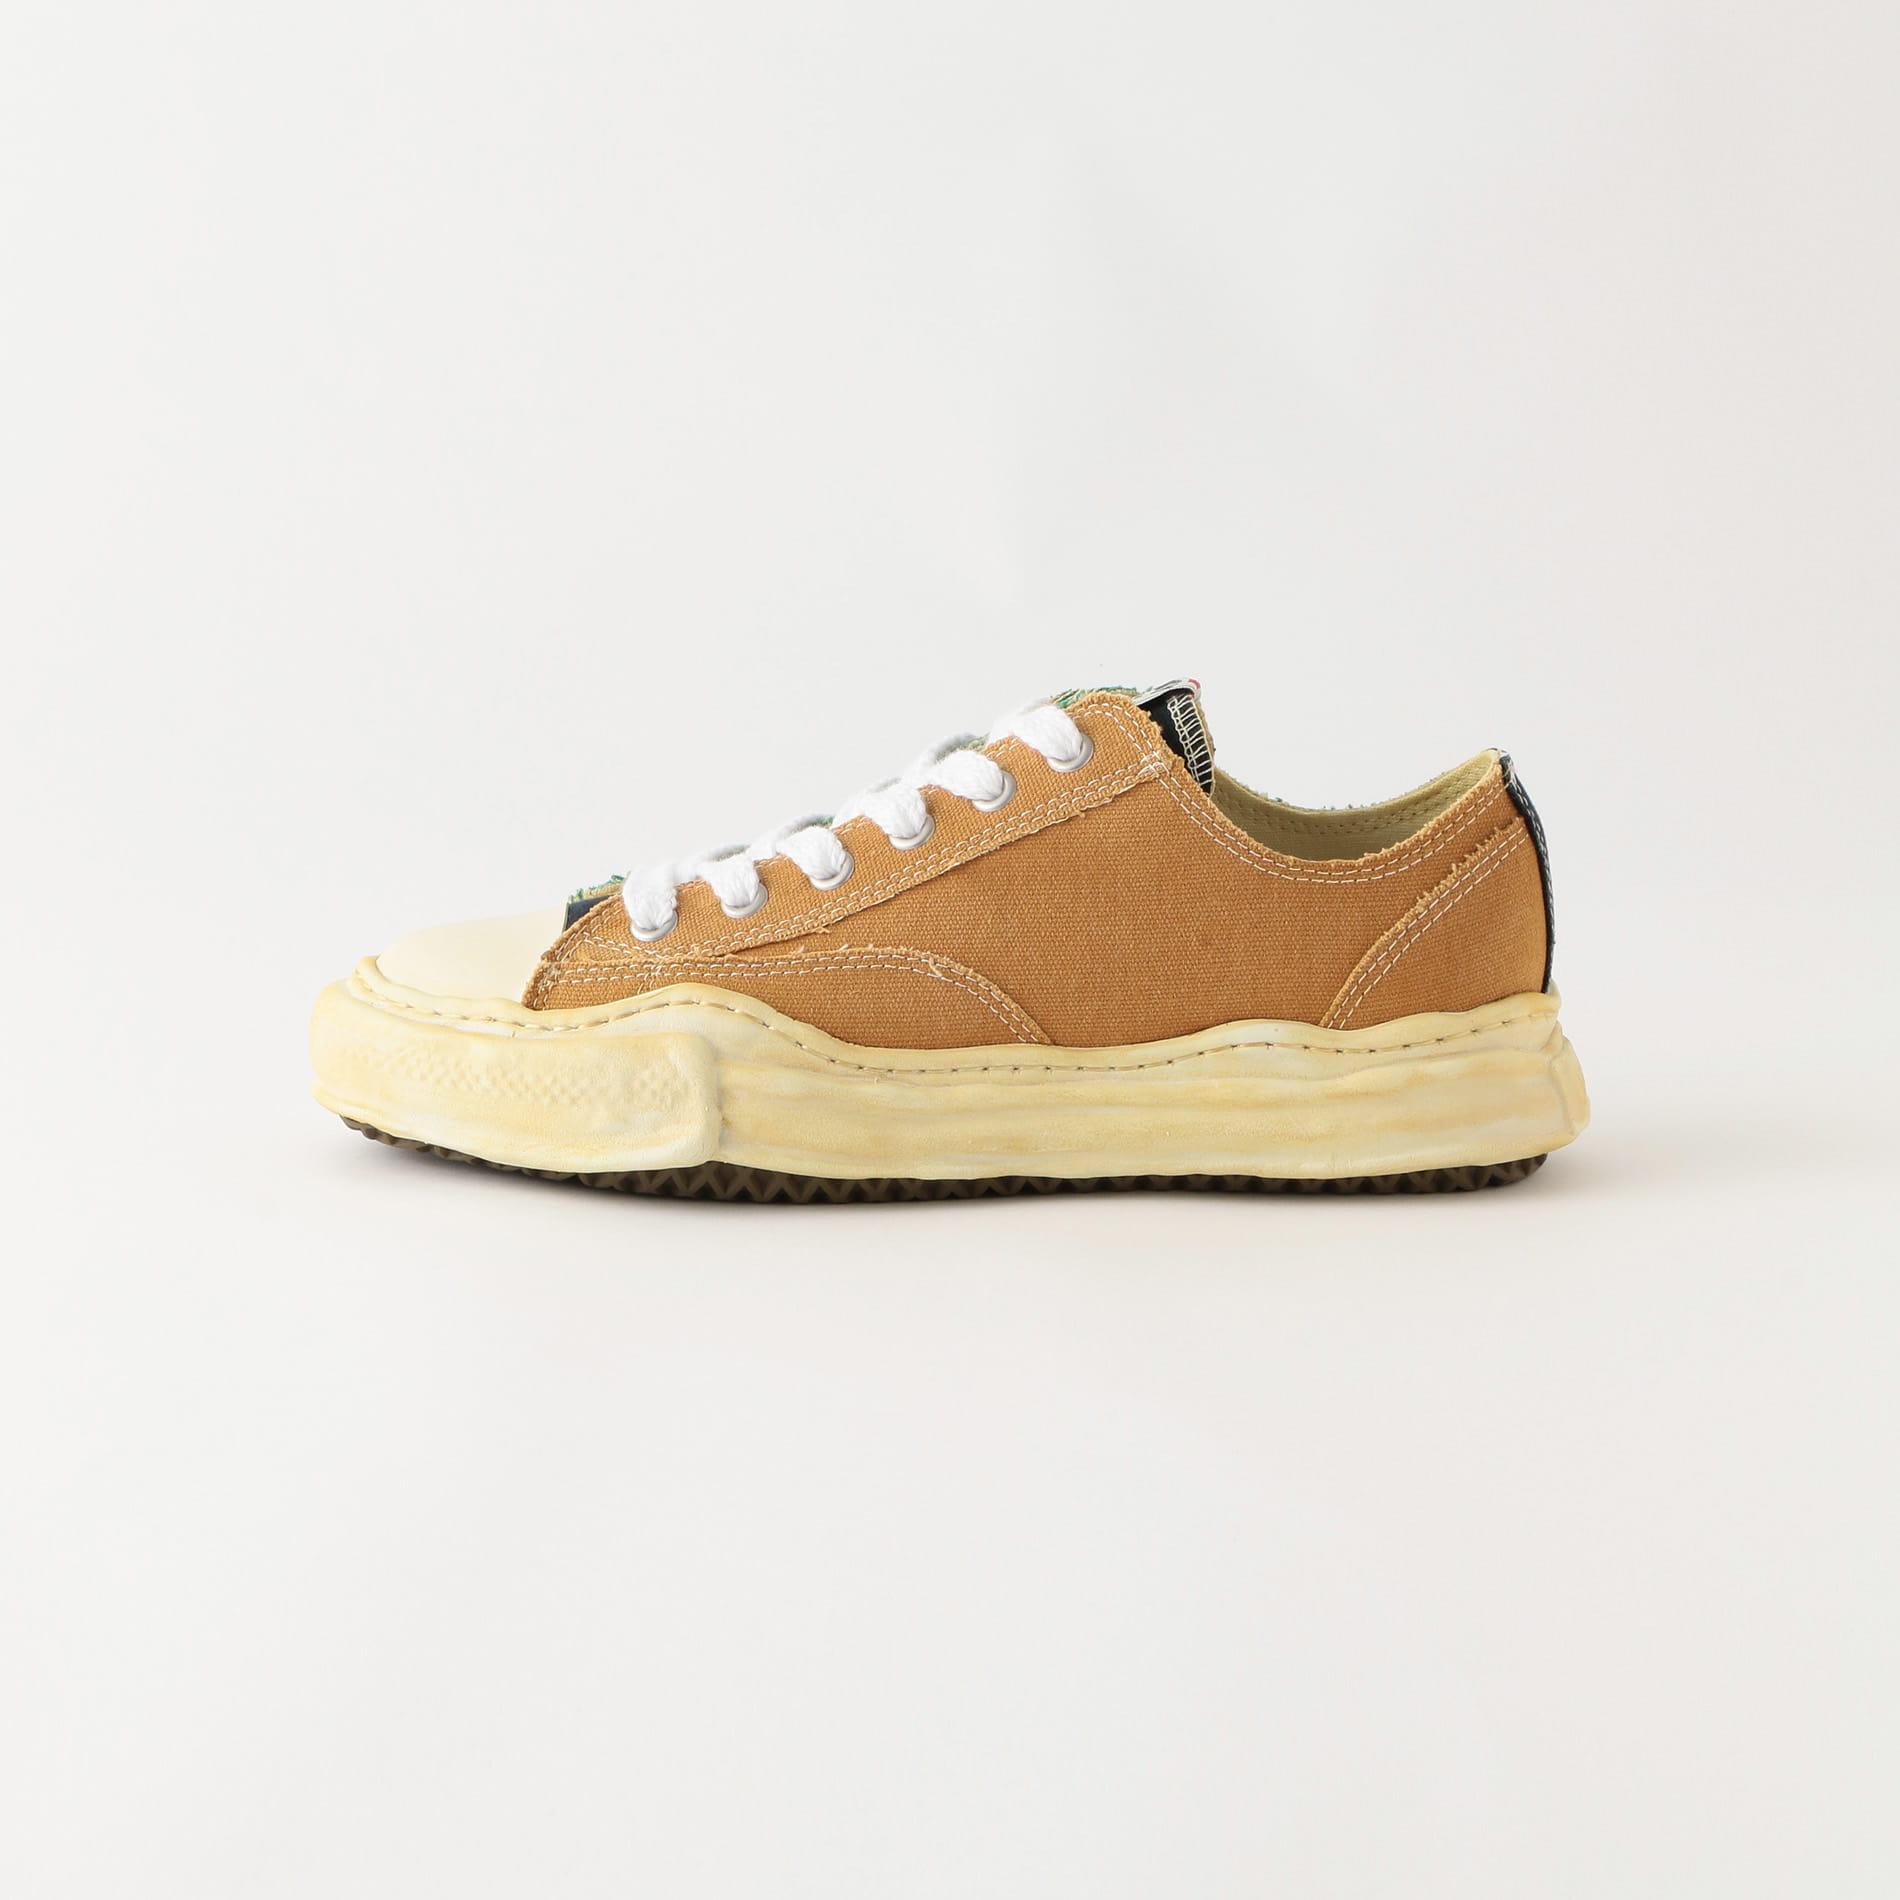 【Maison MIHARA YASUHIRO】MEN original sole over dyed lowcut sneaker A05FW728